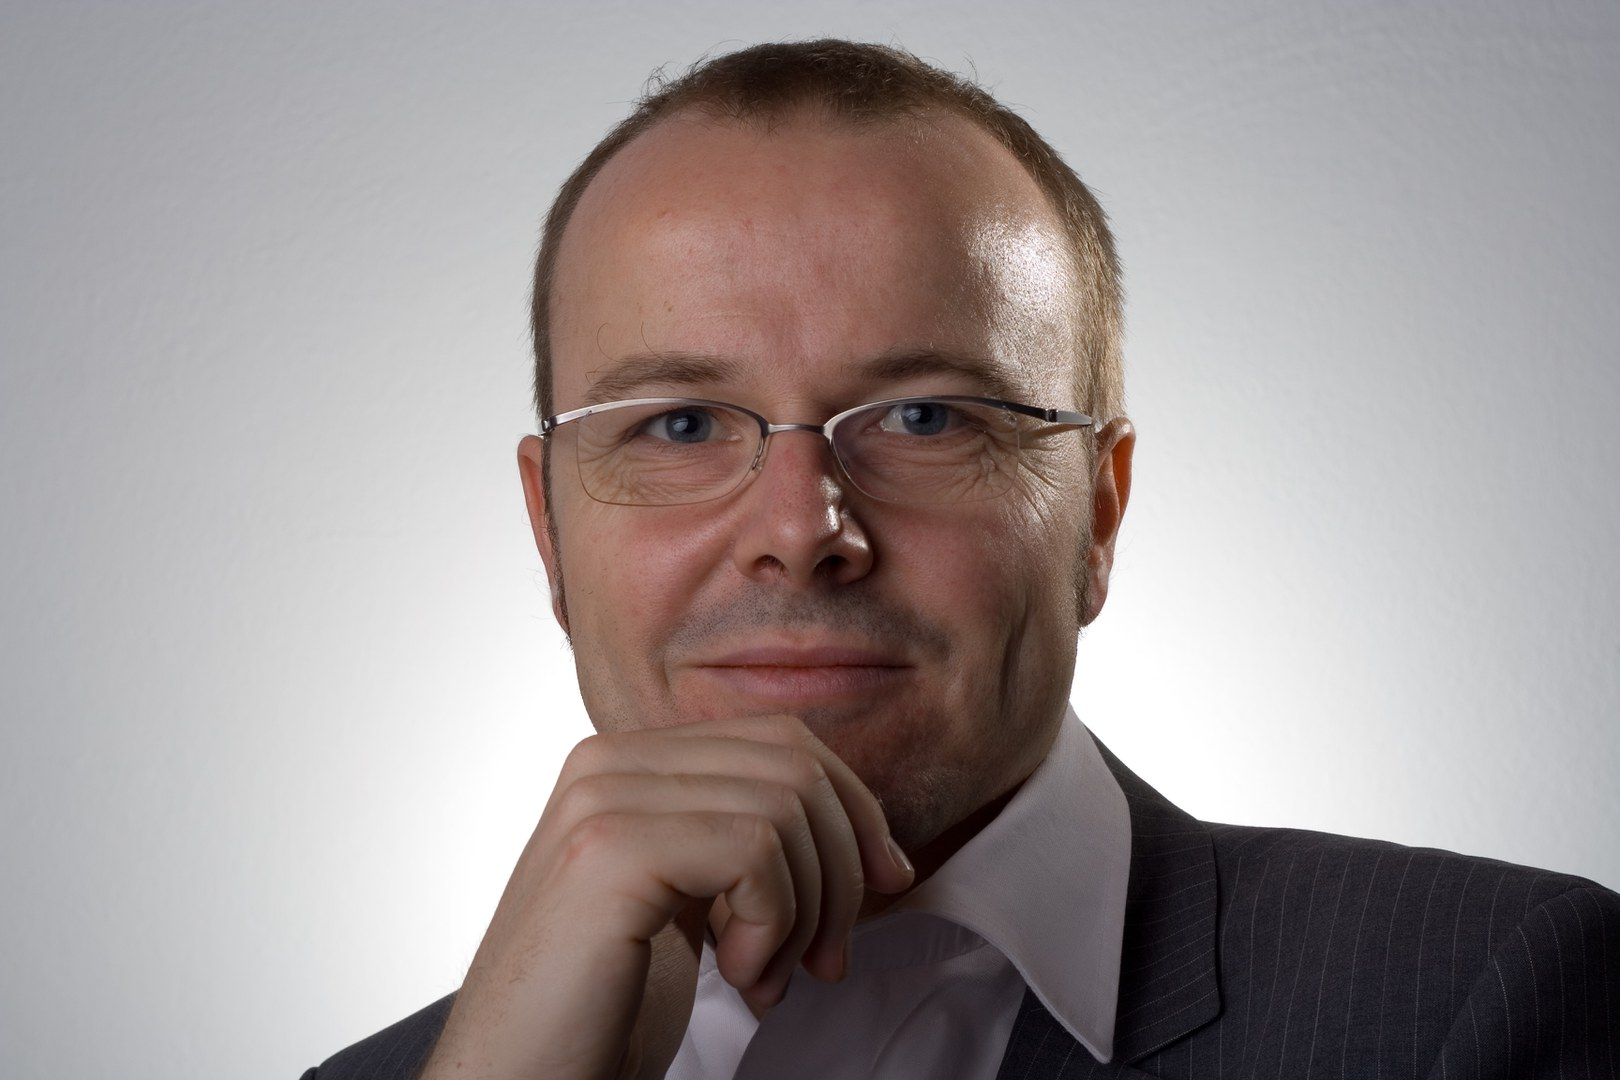 Bild Prof. Dr. Armin Falk erhält den Gossen-Preis